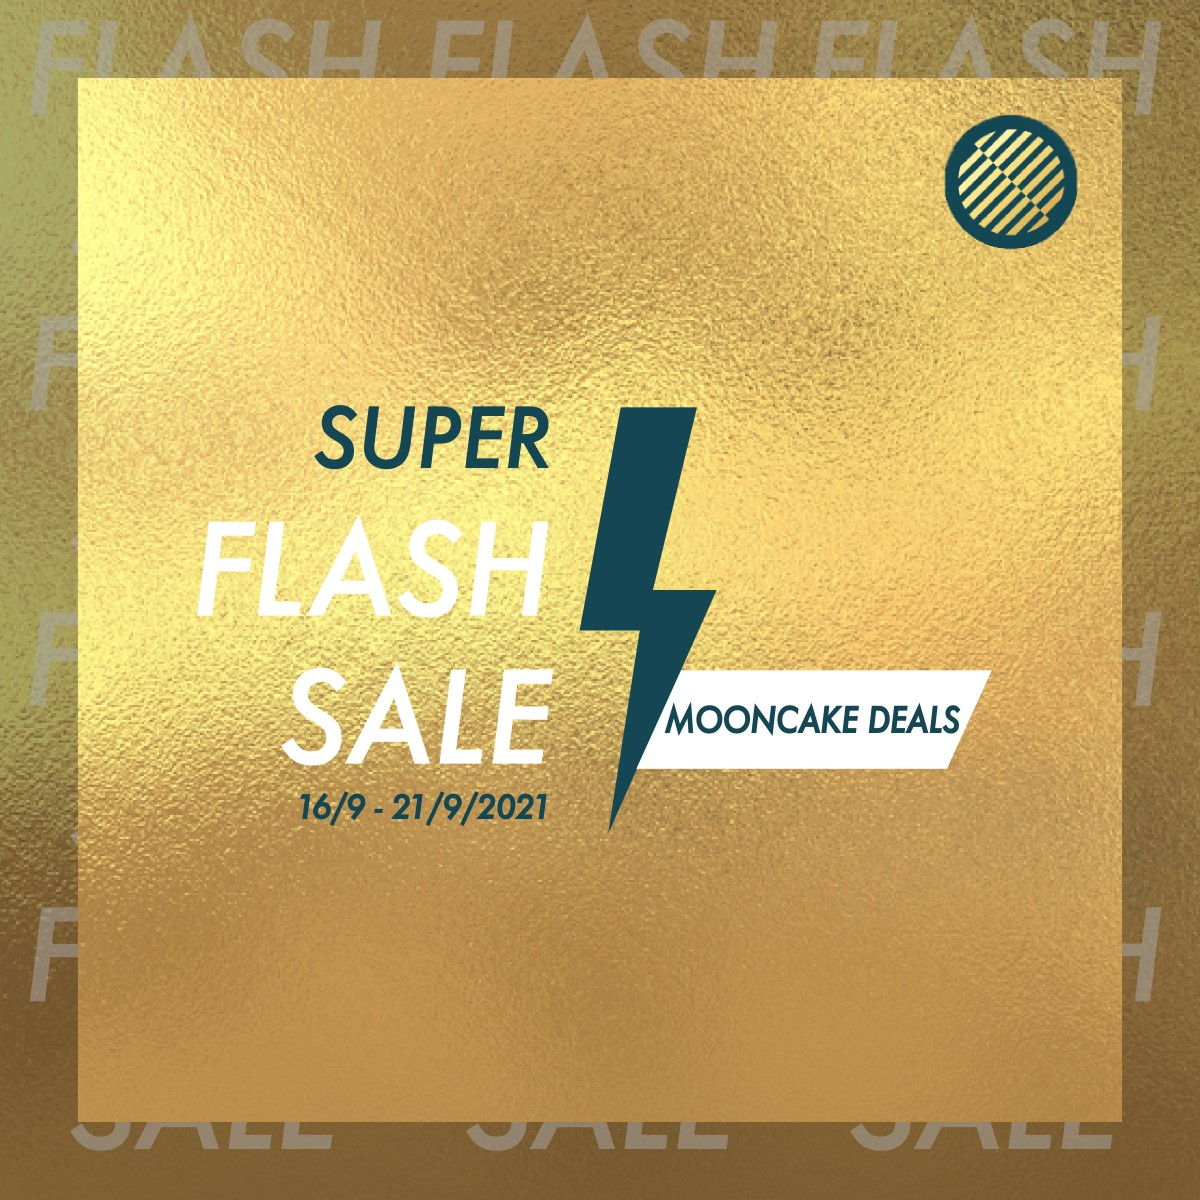 SUPER FLASH SALE – MOONCAKE DEALS 2021